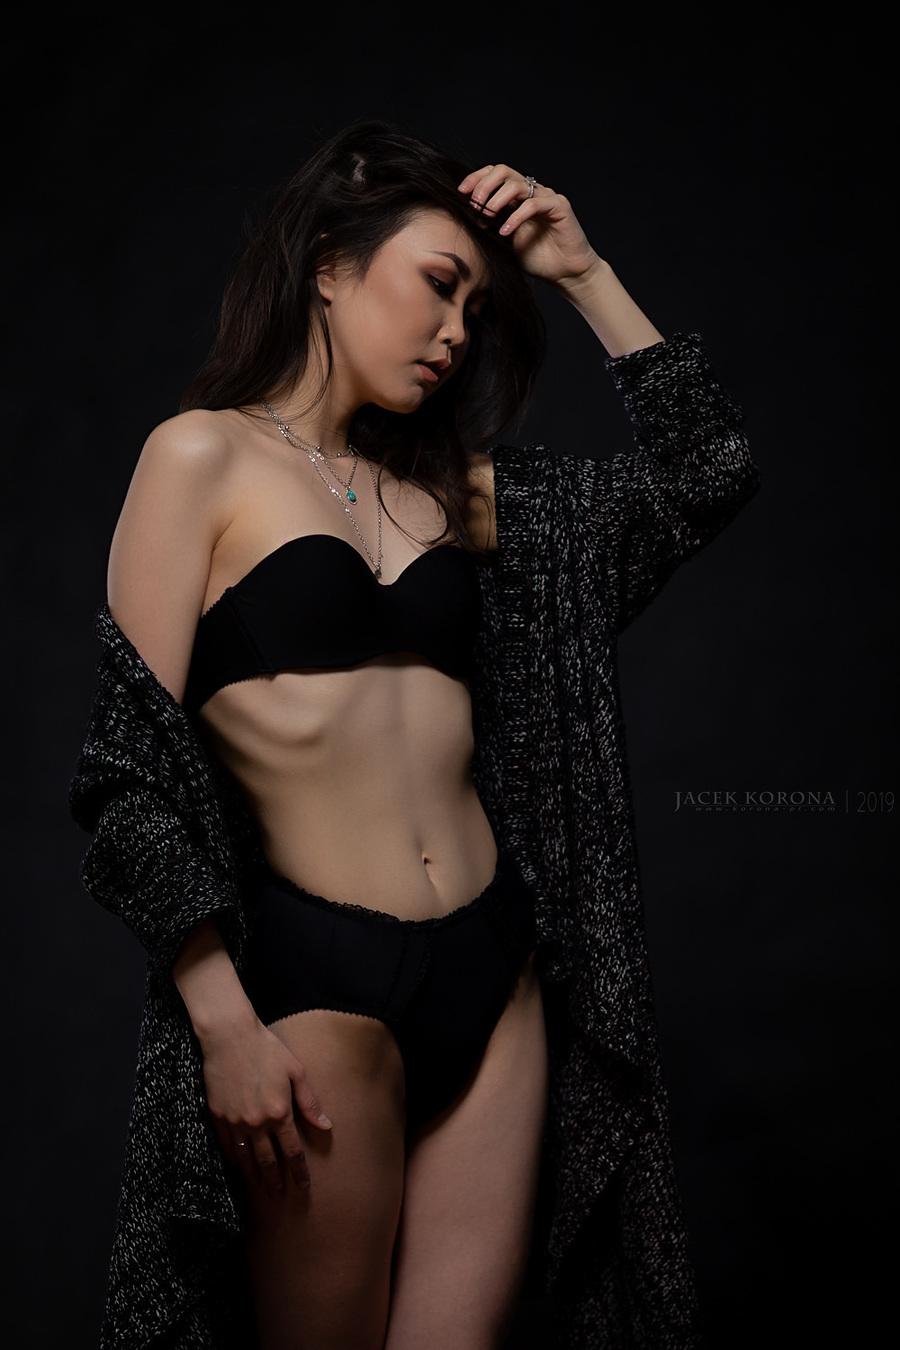 Anuka / Photography by Jacek Korona / Uploaded 18th October 2019 @ 03:51 PM